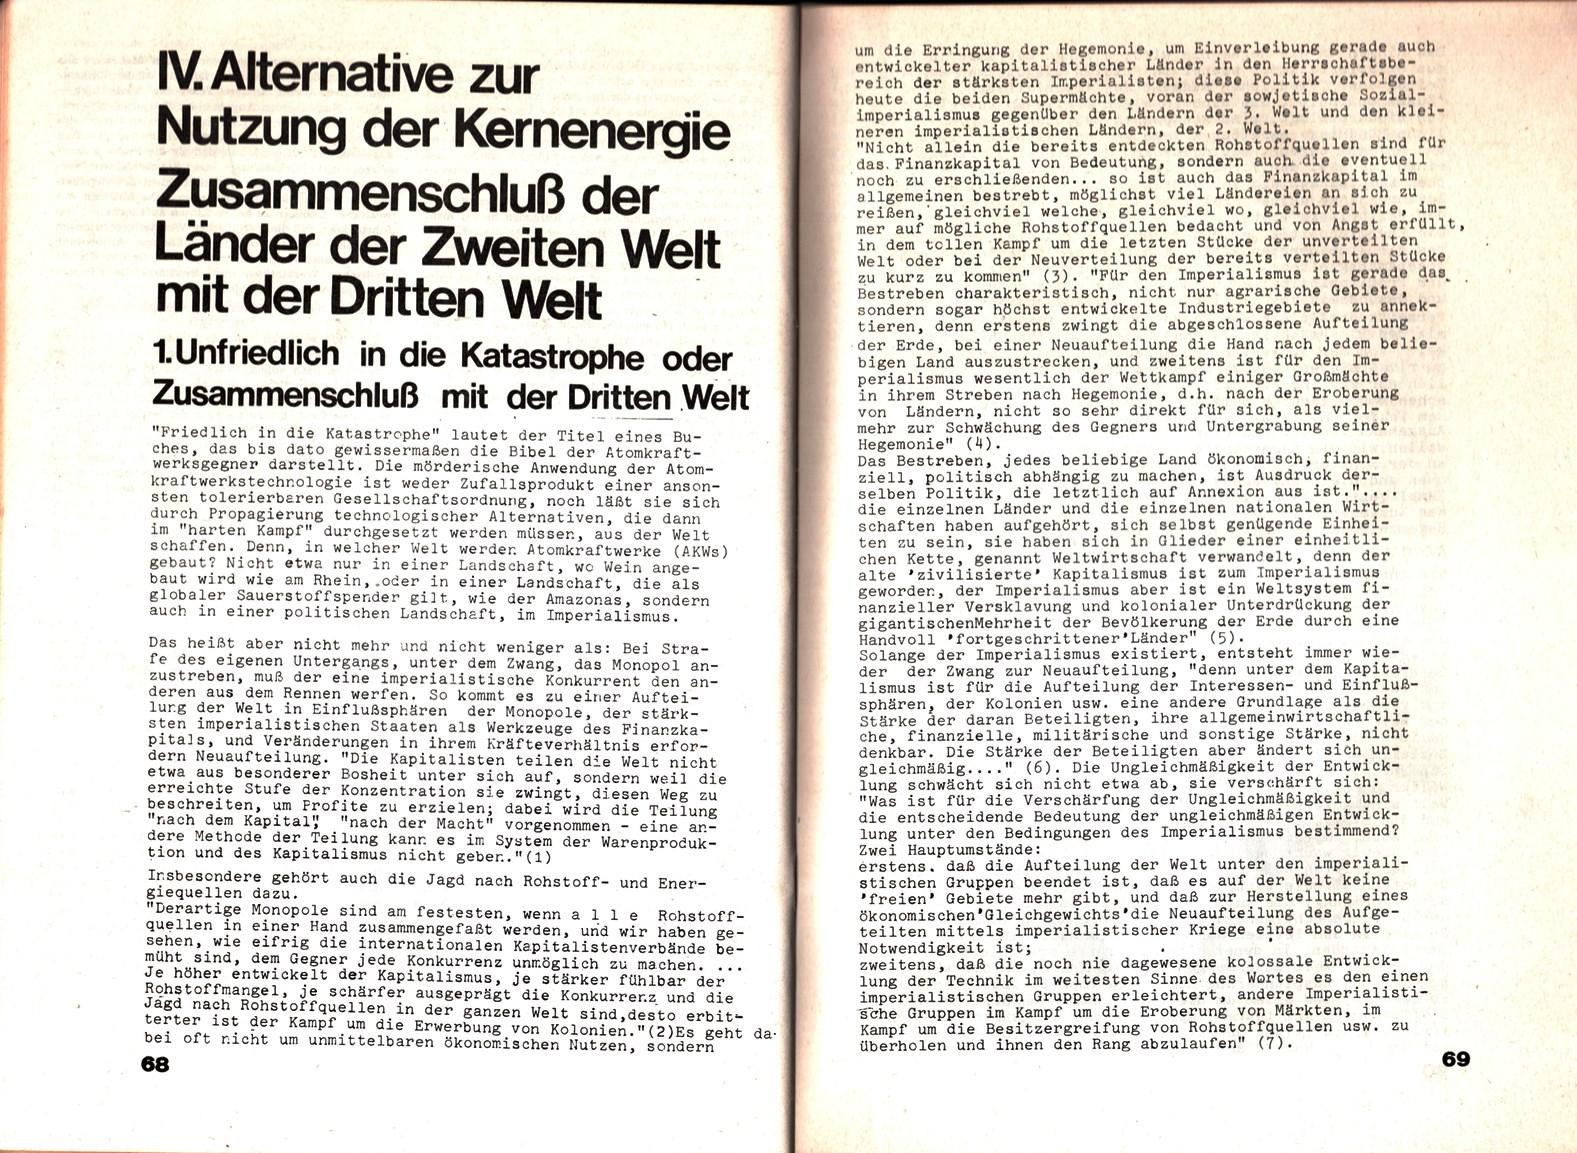 KSV_1976_Atomenergie_im_Kapitalismus_036